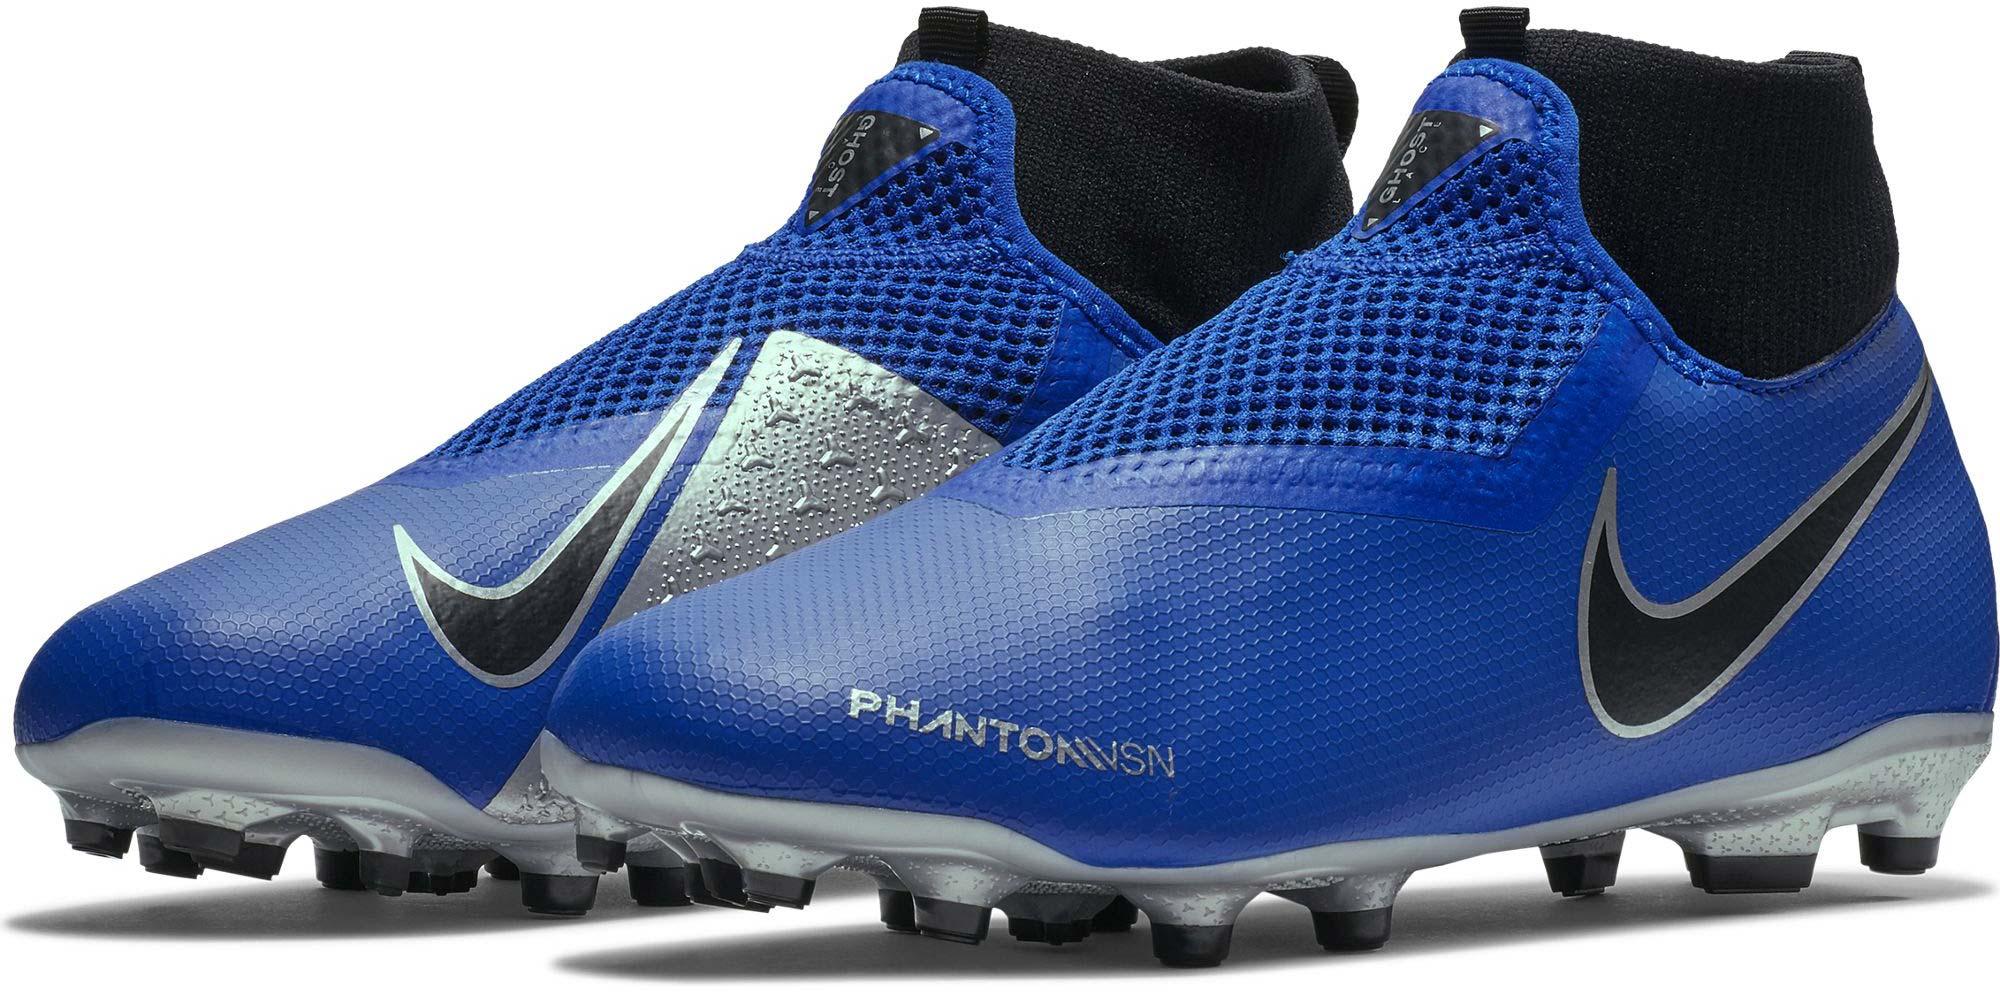 a4c294822 Nike JR PHANTOM VISION ACADEMY DYNAMIC FIT FG